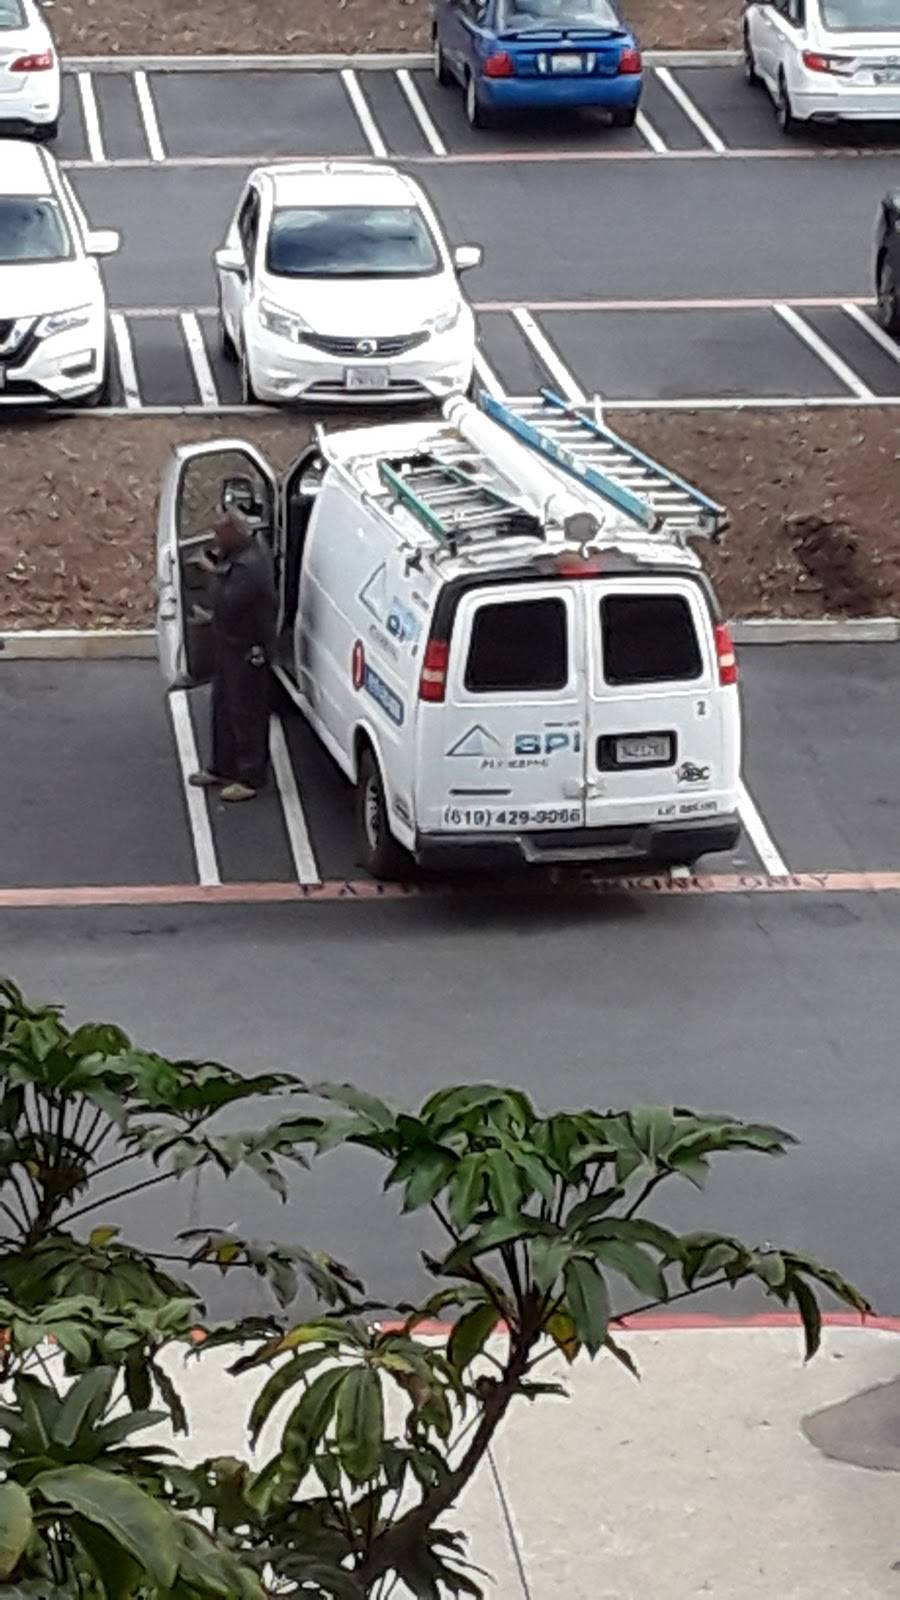 BPI Plumbing - plumber    Photo 5 of 9   Address: 1021 Bay Blvd suite s, Chula Vista, CA 91911, USA   Phone: (619) 429-9066